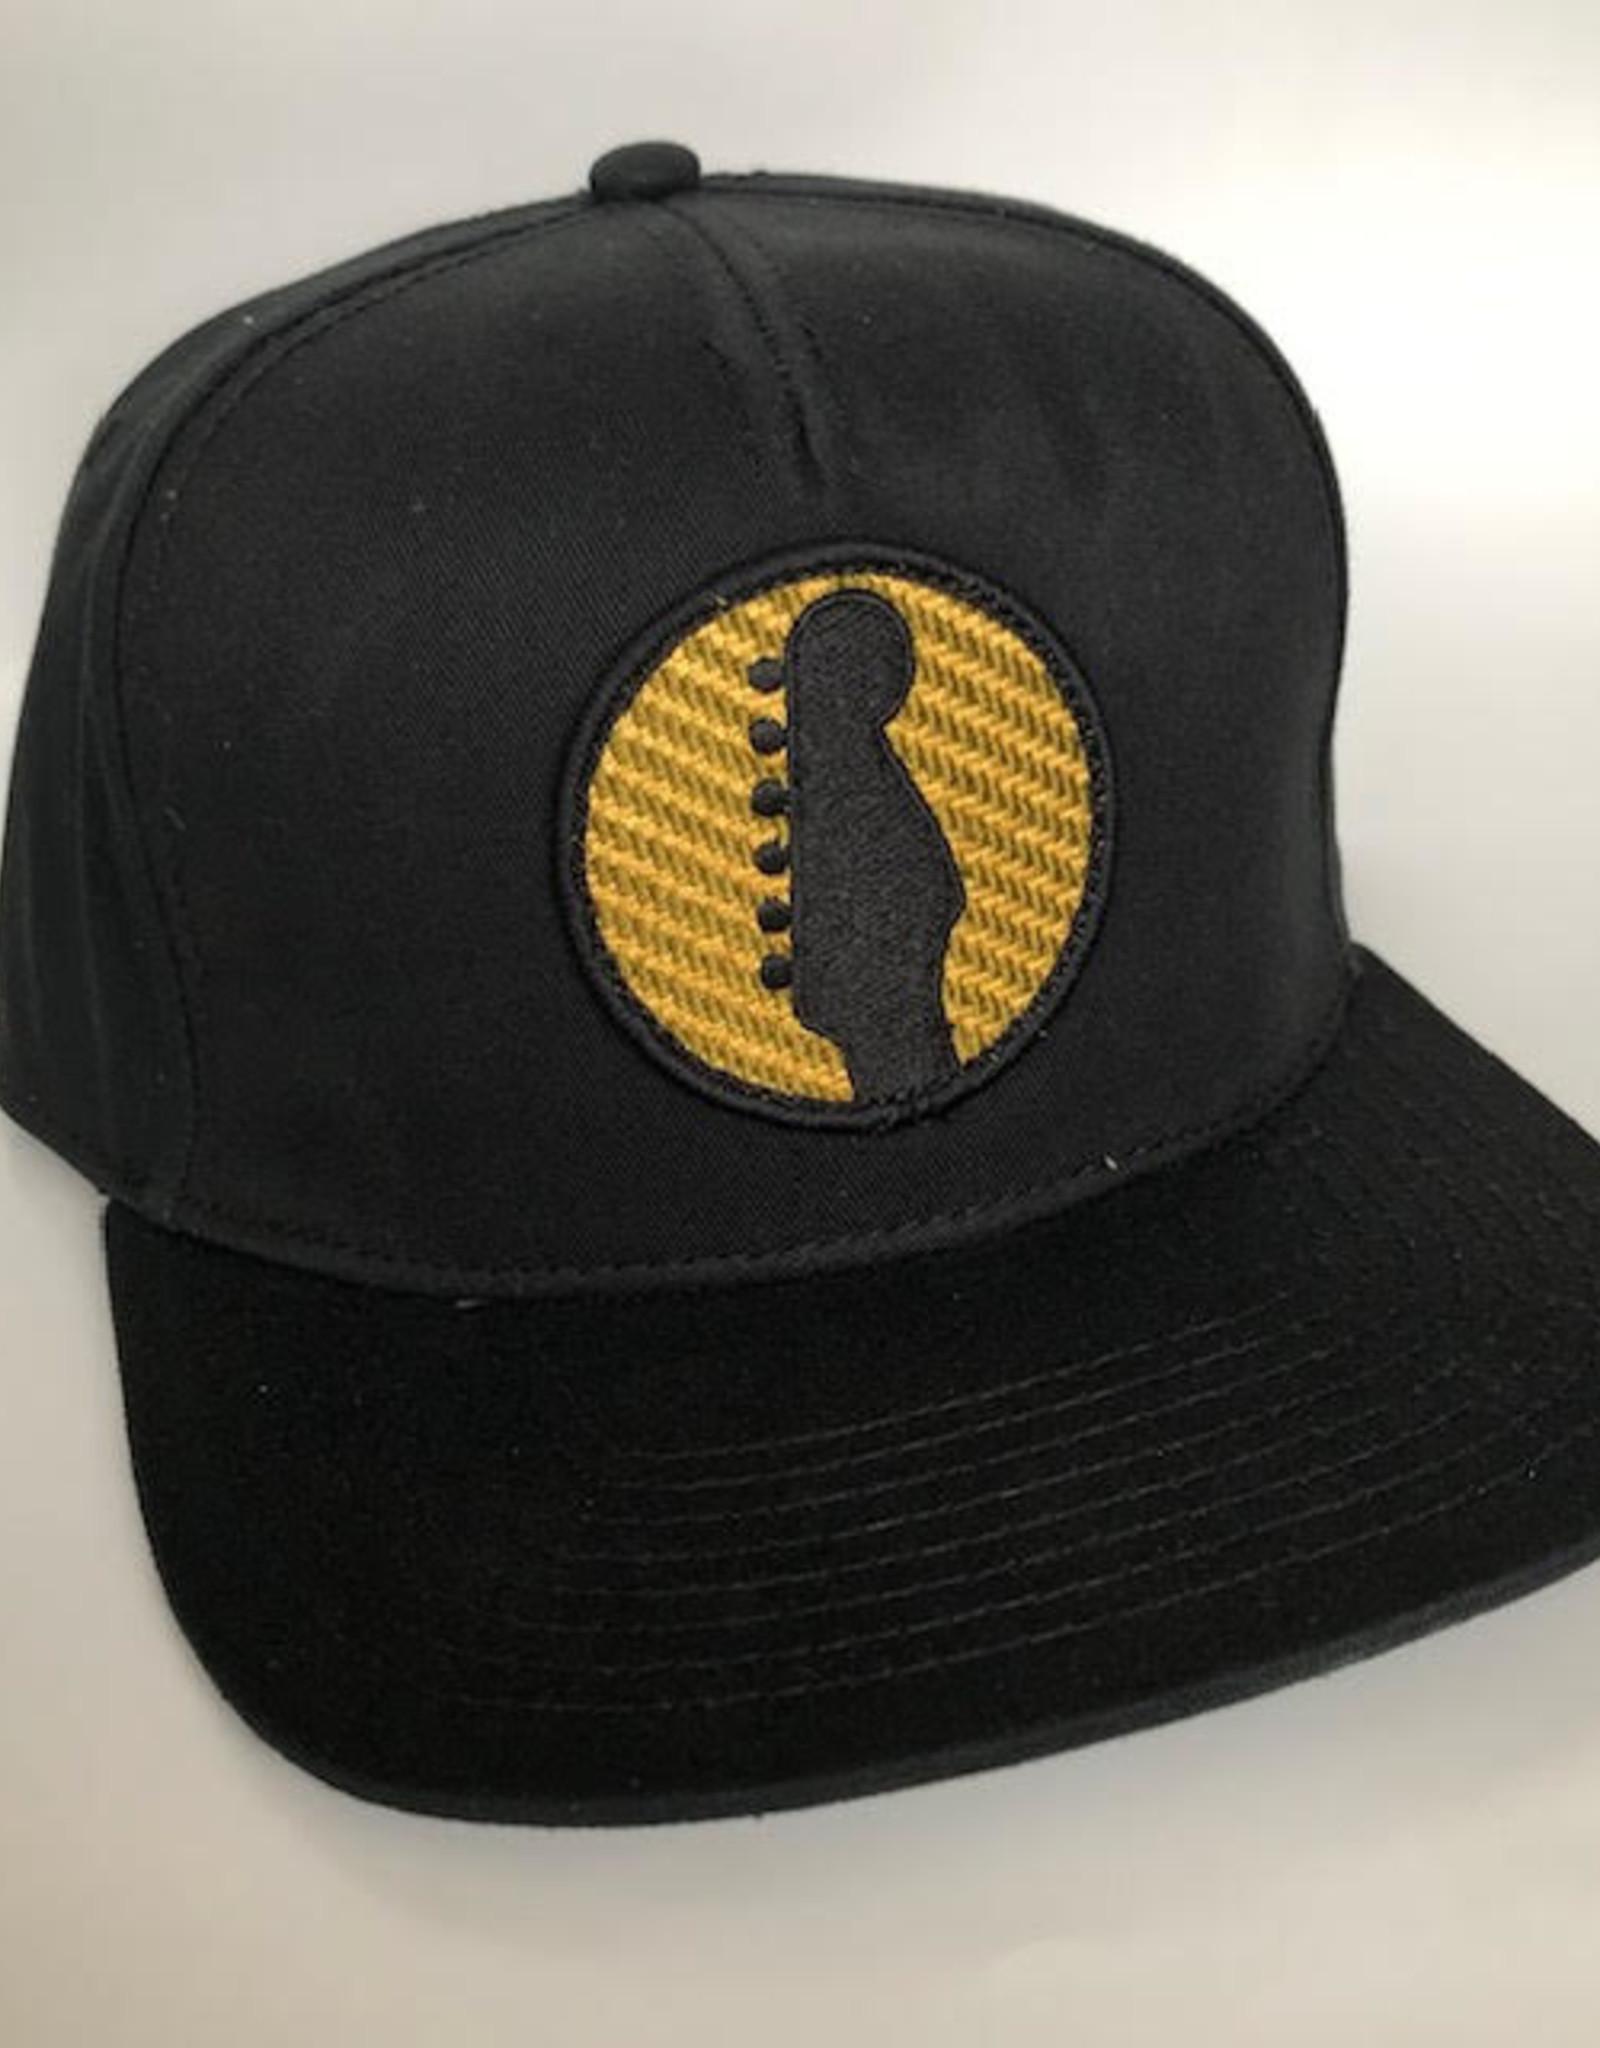 Fender Fender Headstock Twill Snapback Hat, Black